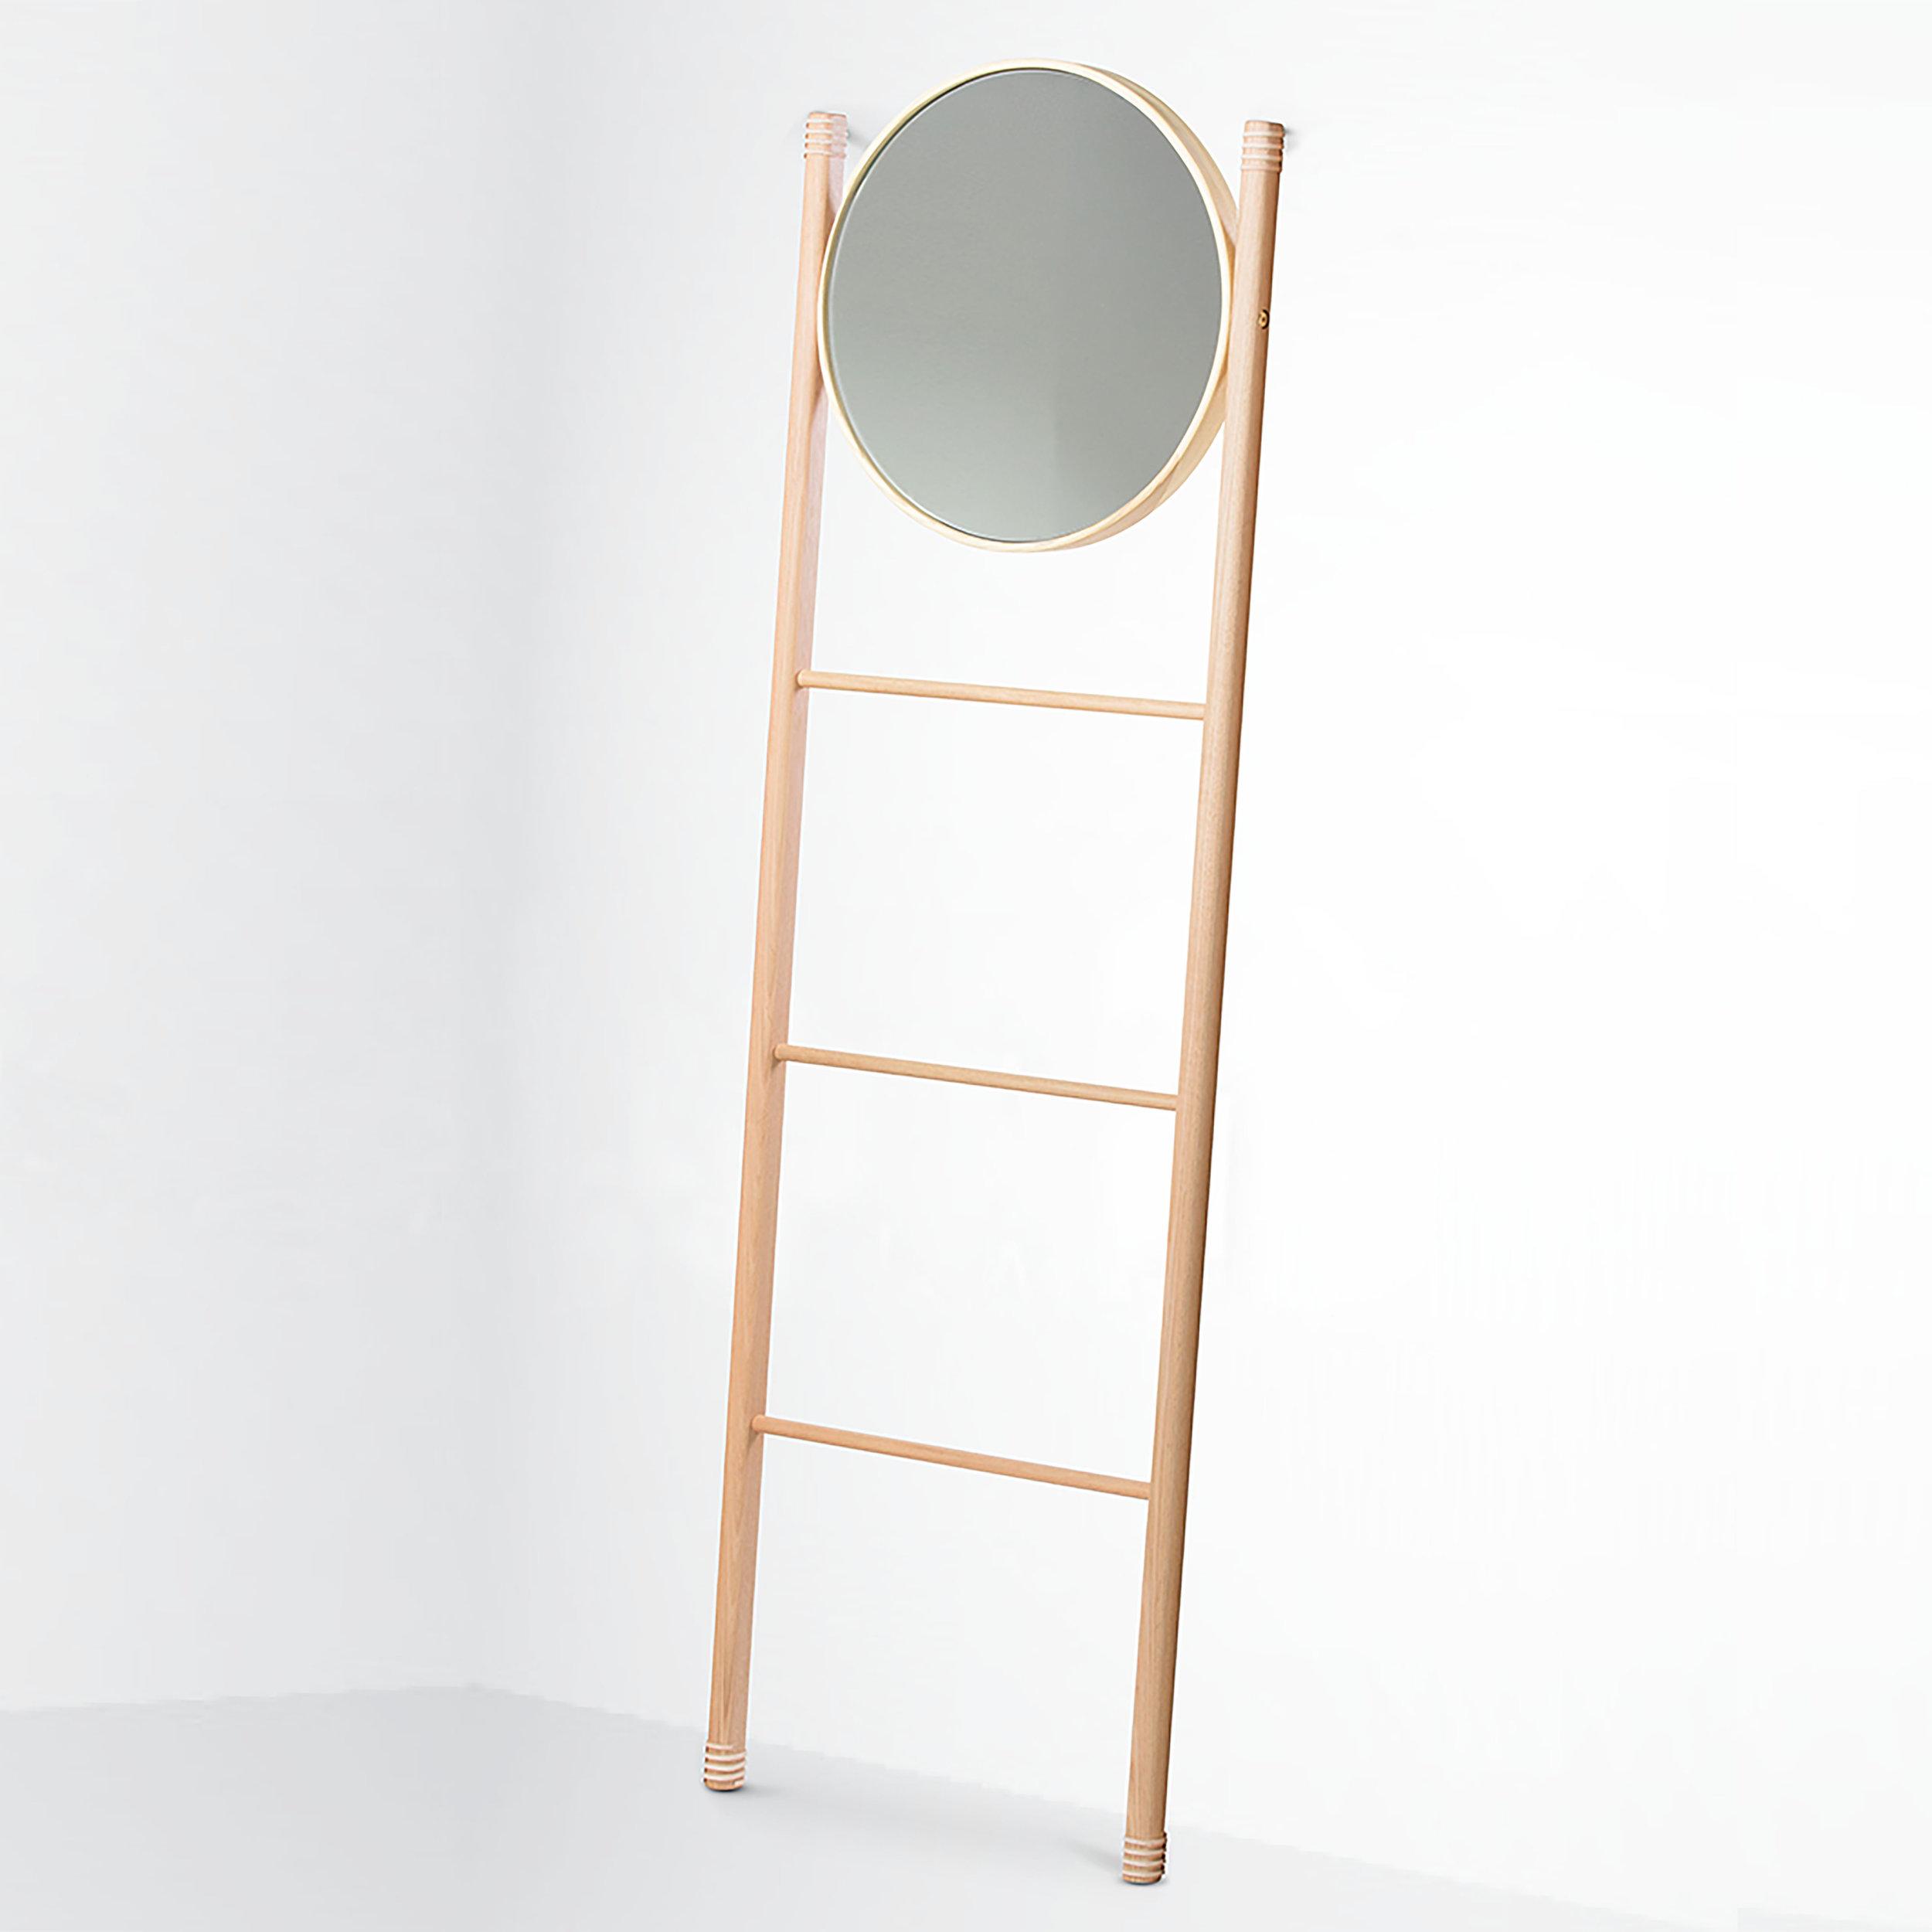 Beeline Design 'Cuba' mirror ladder rack